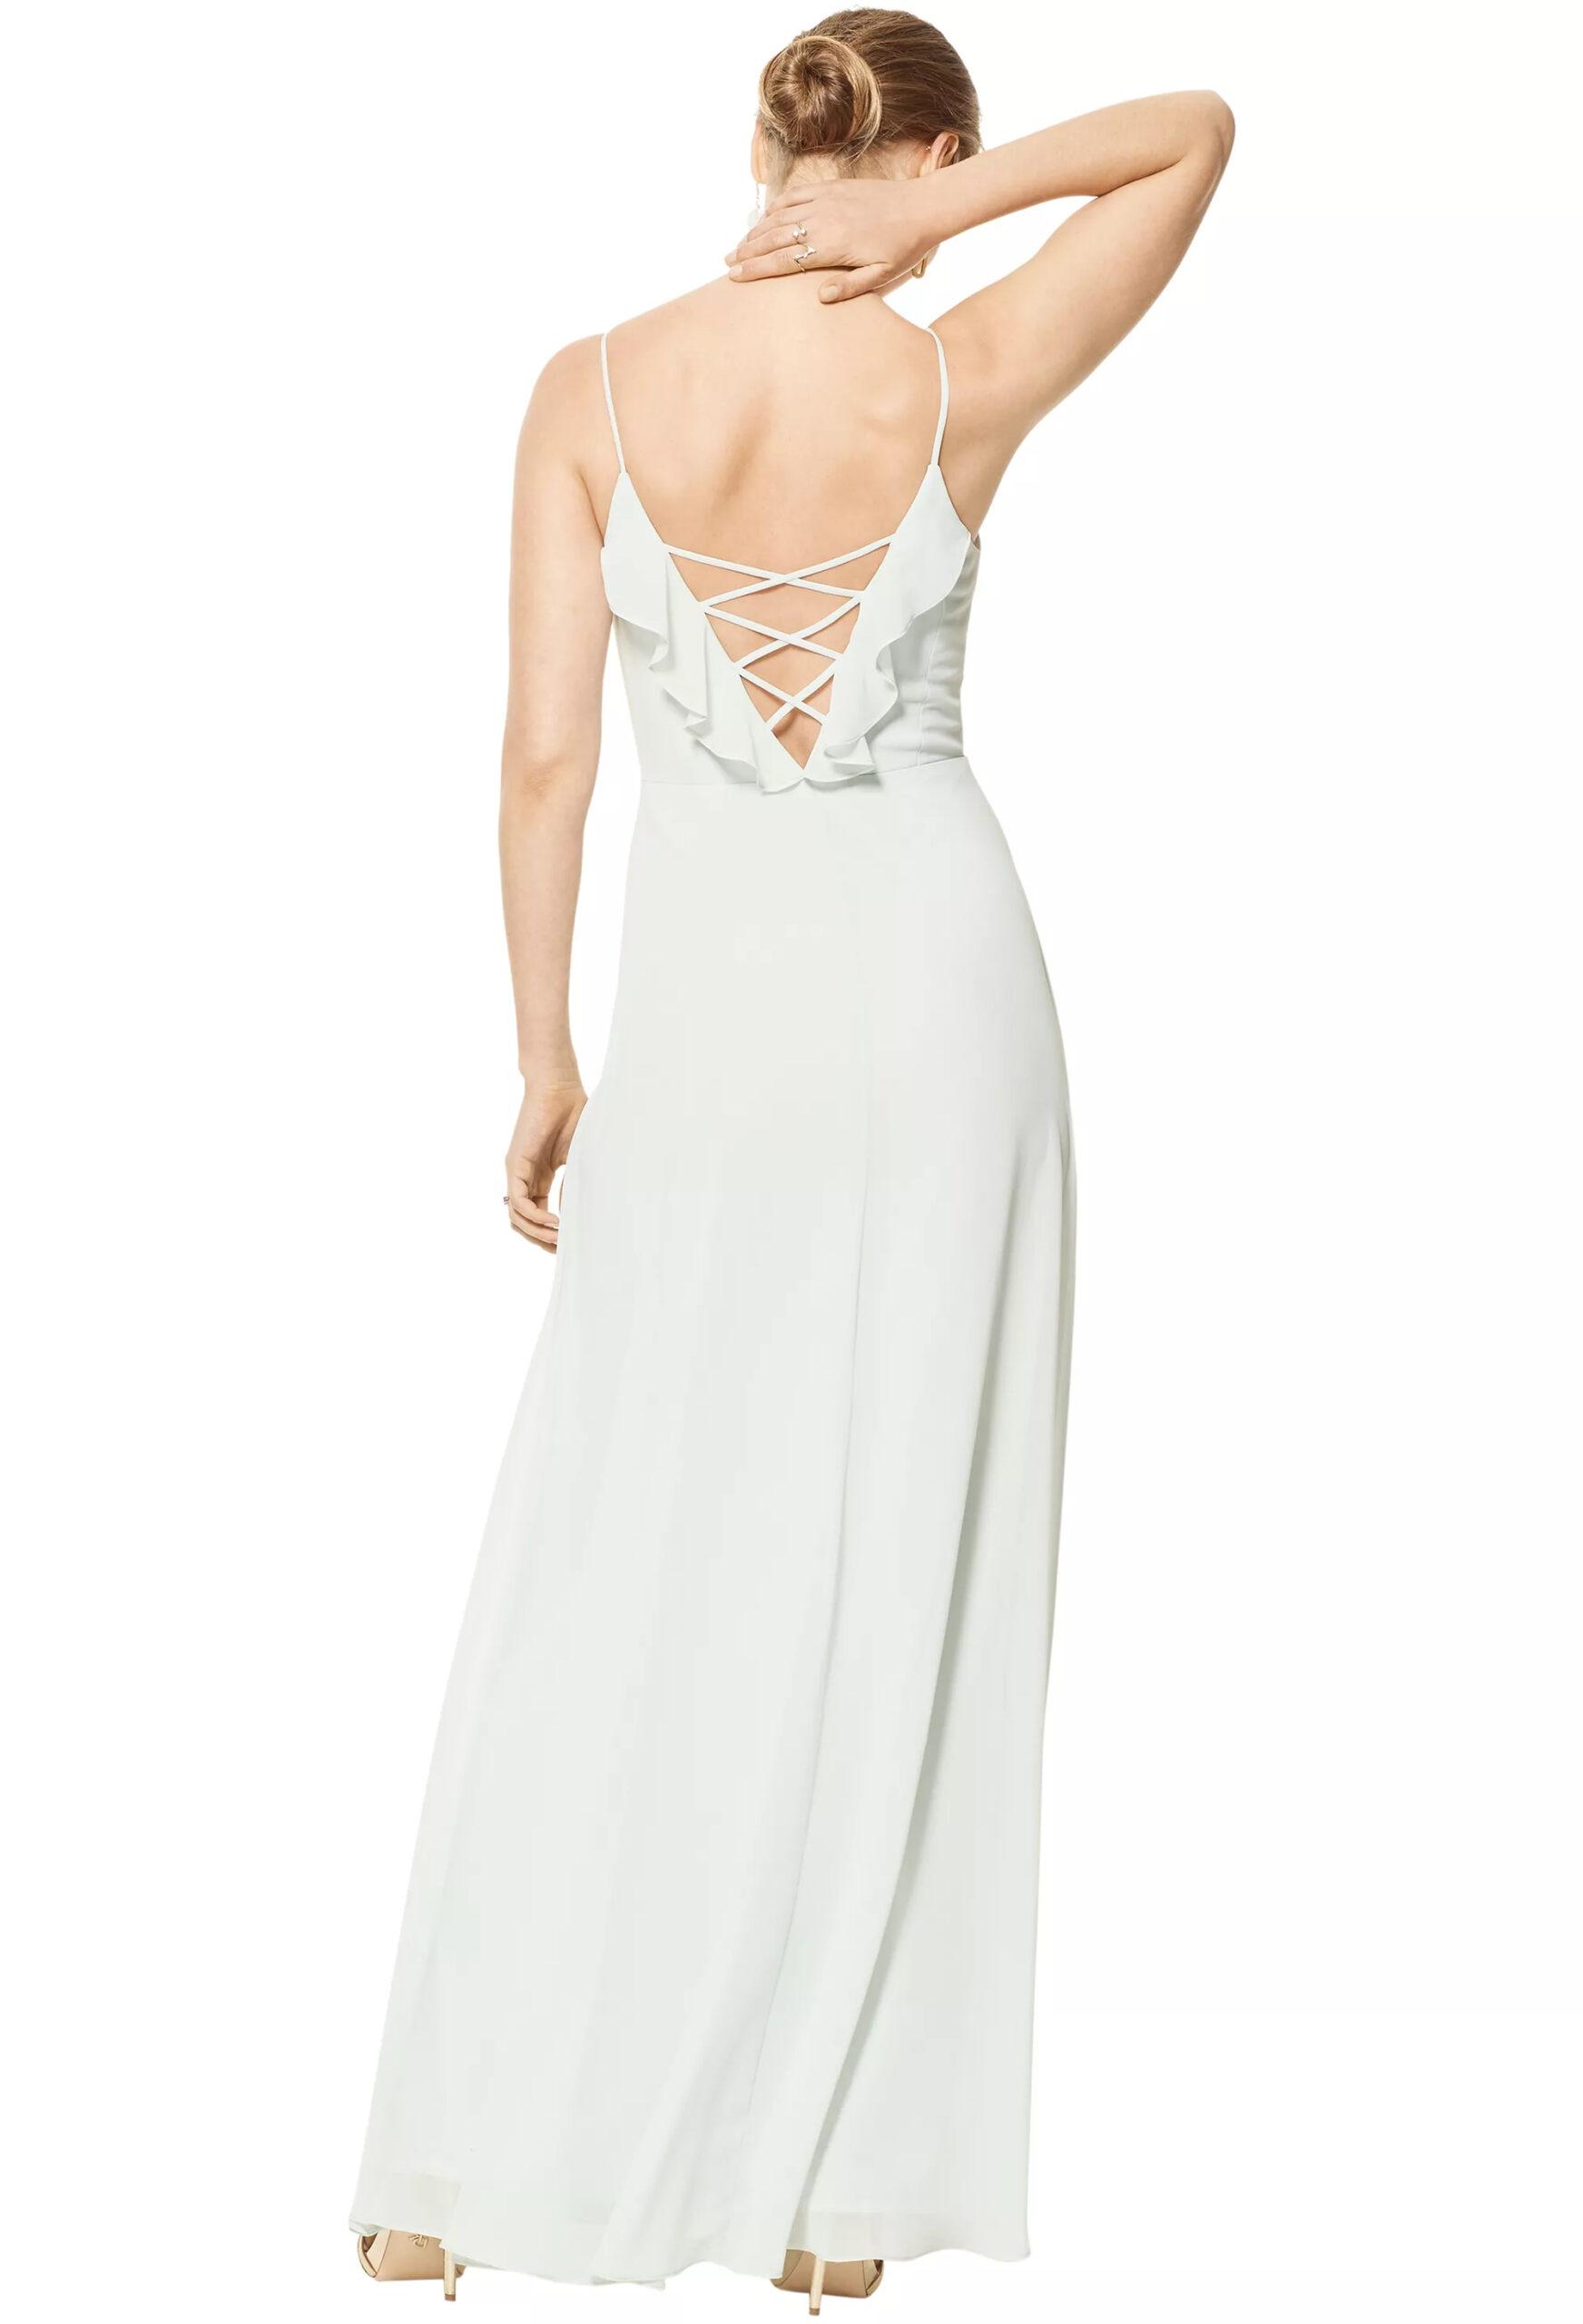 billlevkoff-bridesmaid-03-scaled.jpg